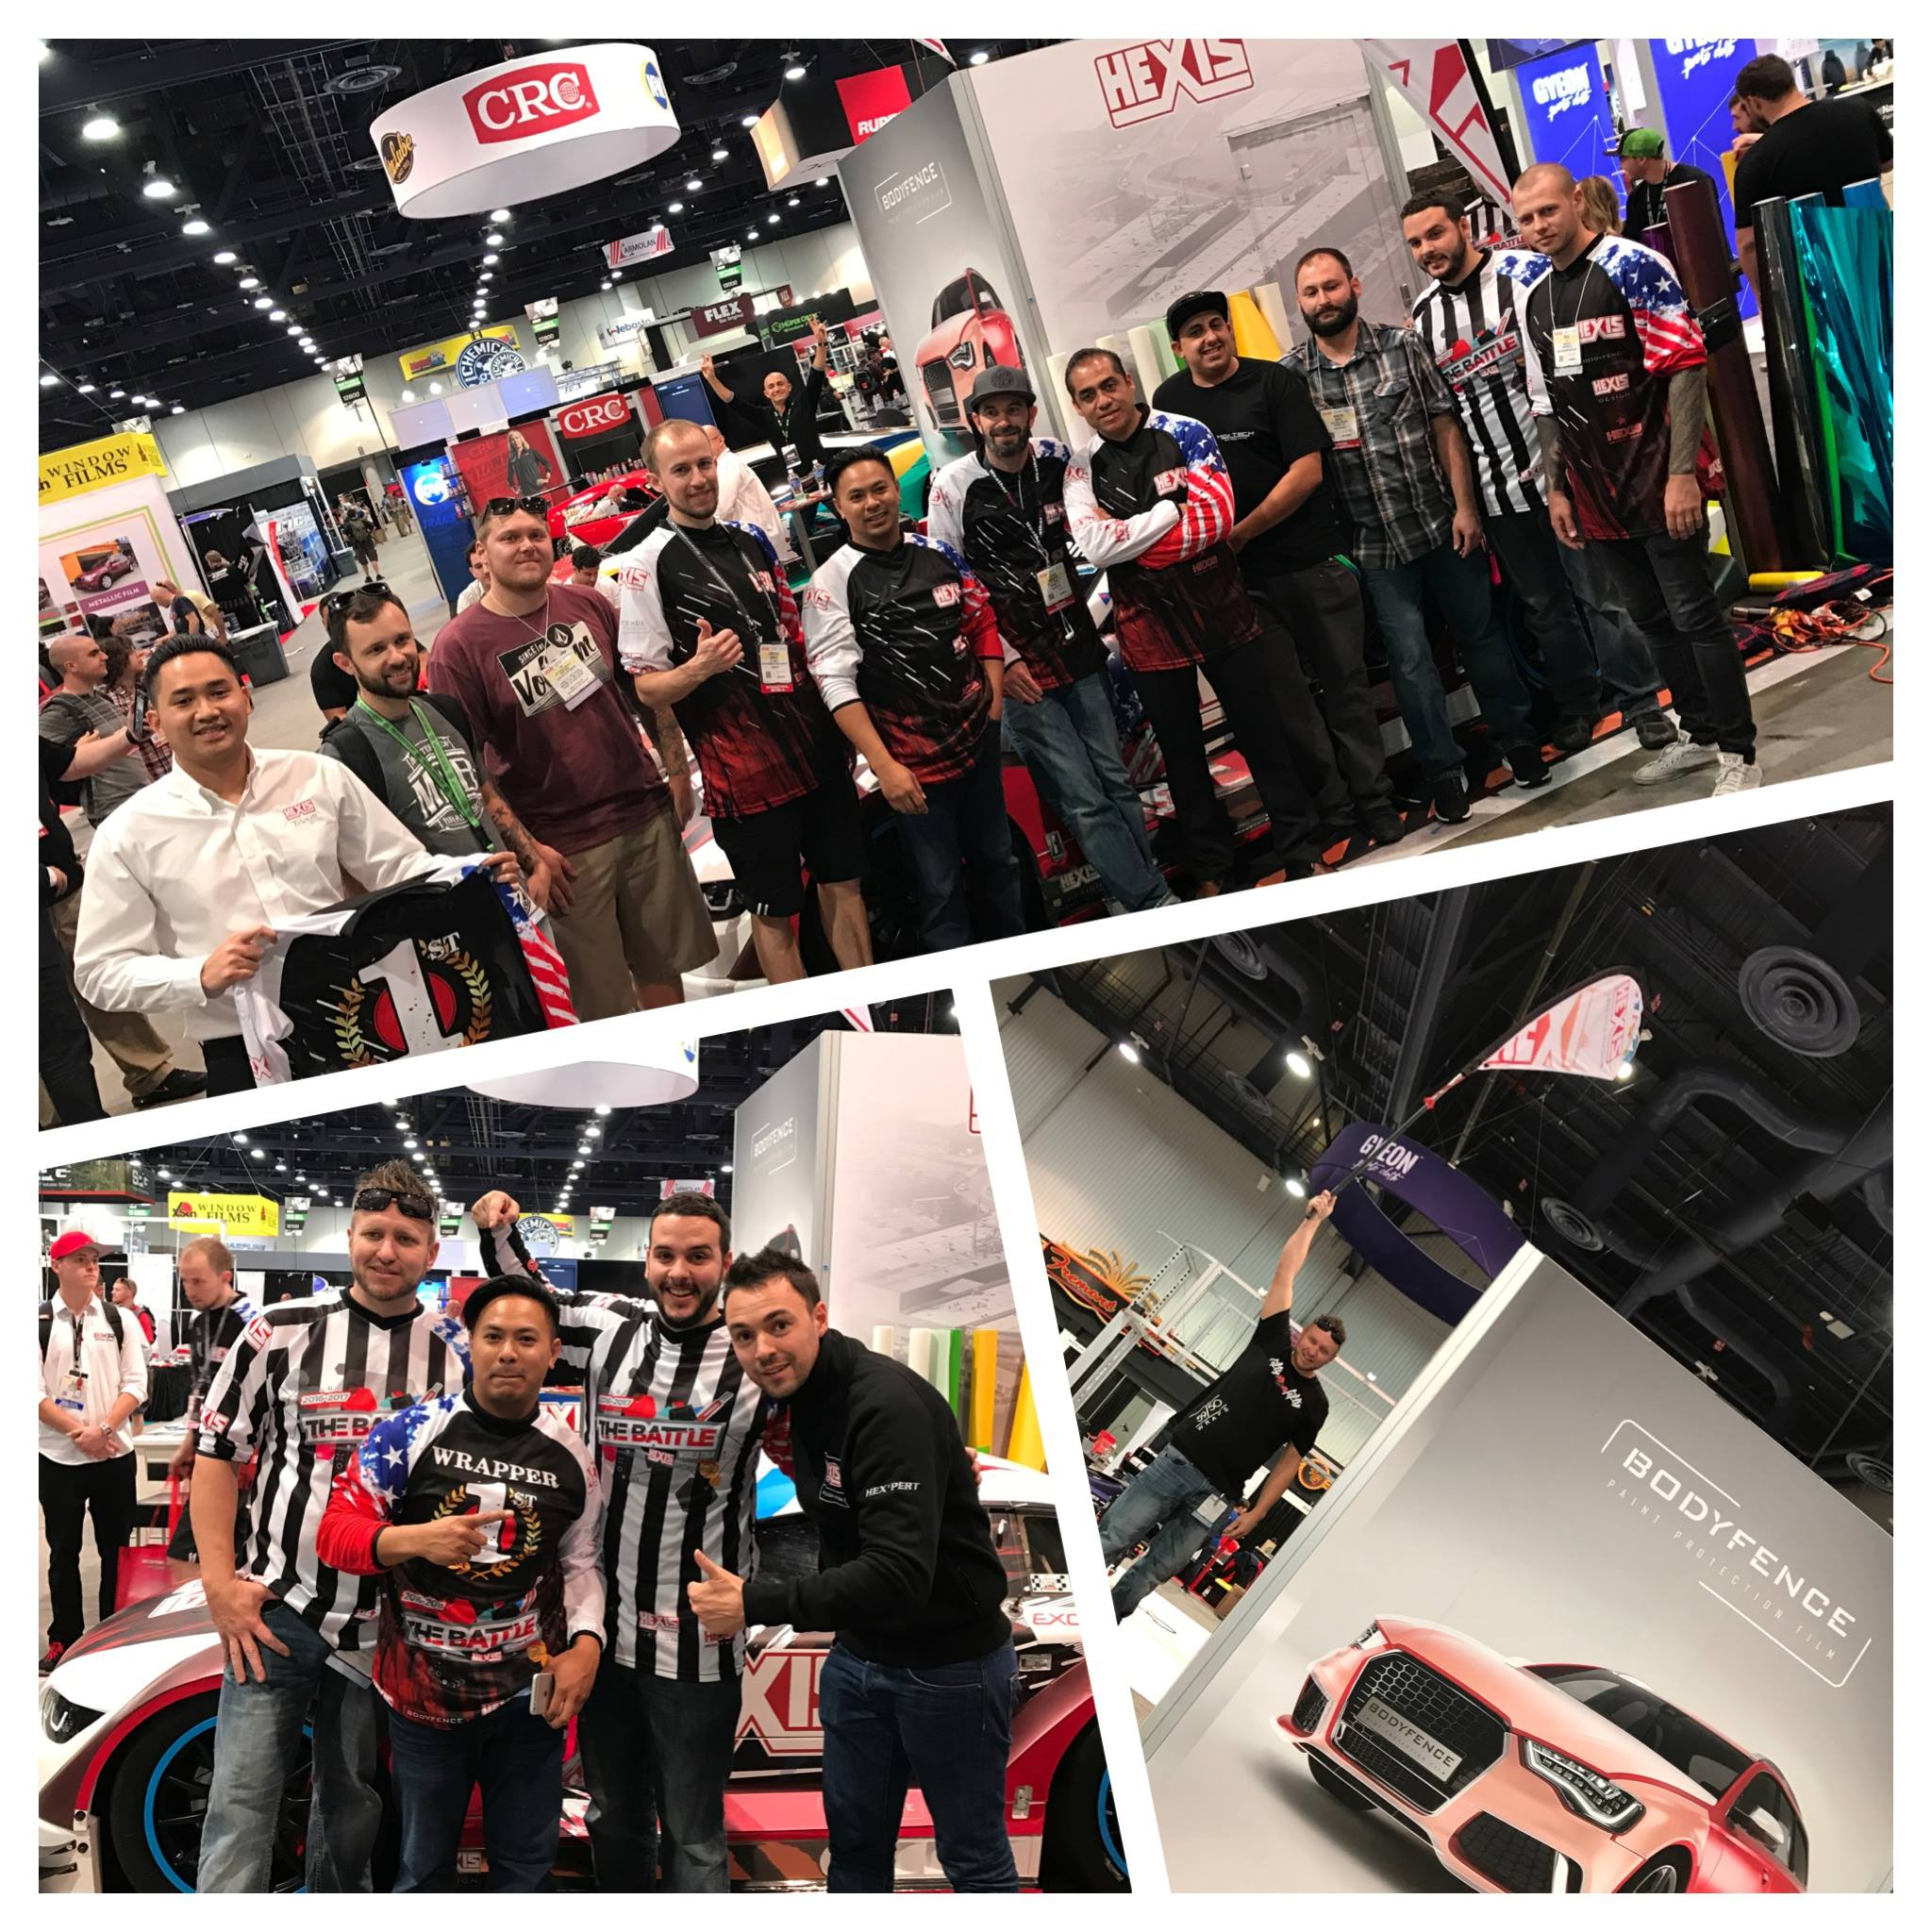 HEXIS at SEMA Show in Las Vegas! - HEXIS Graphics